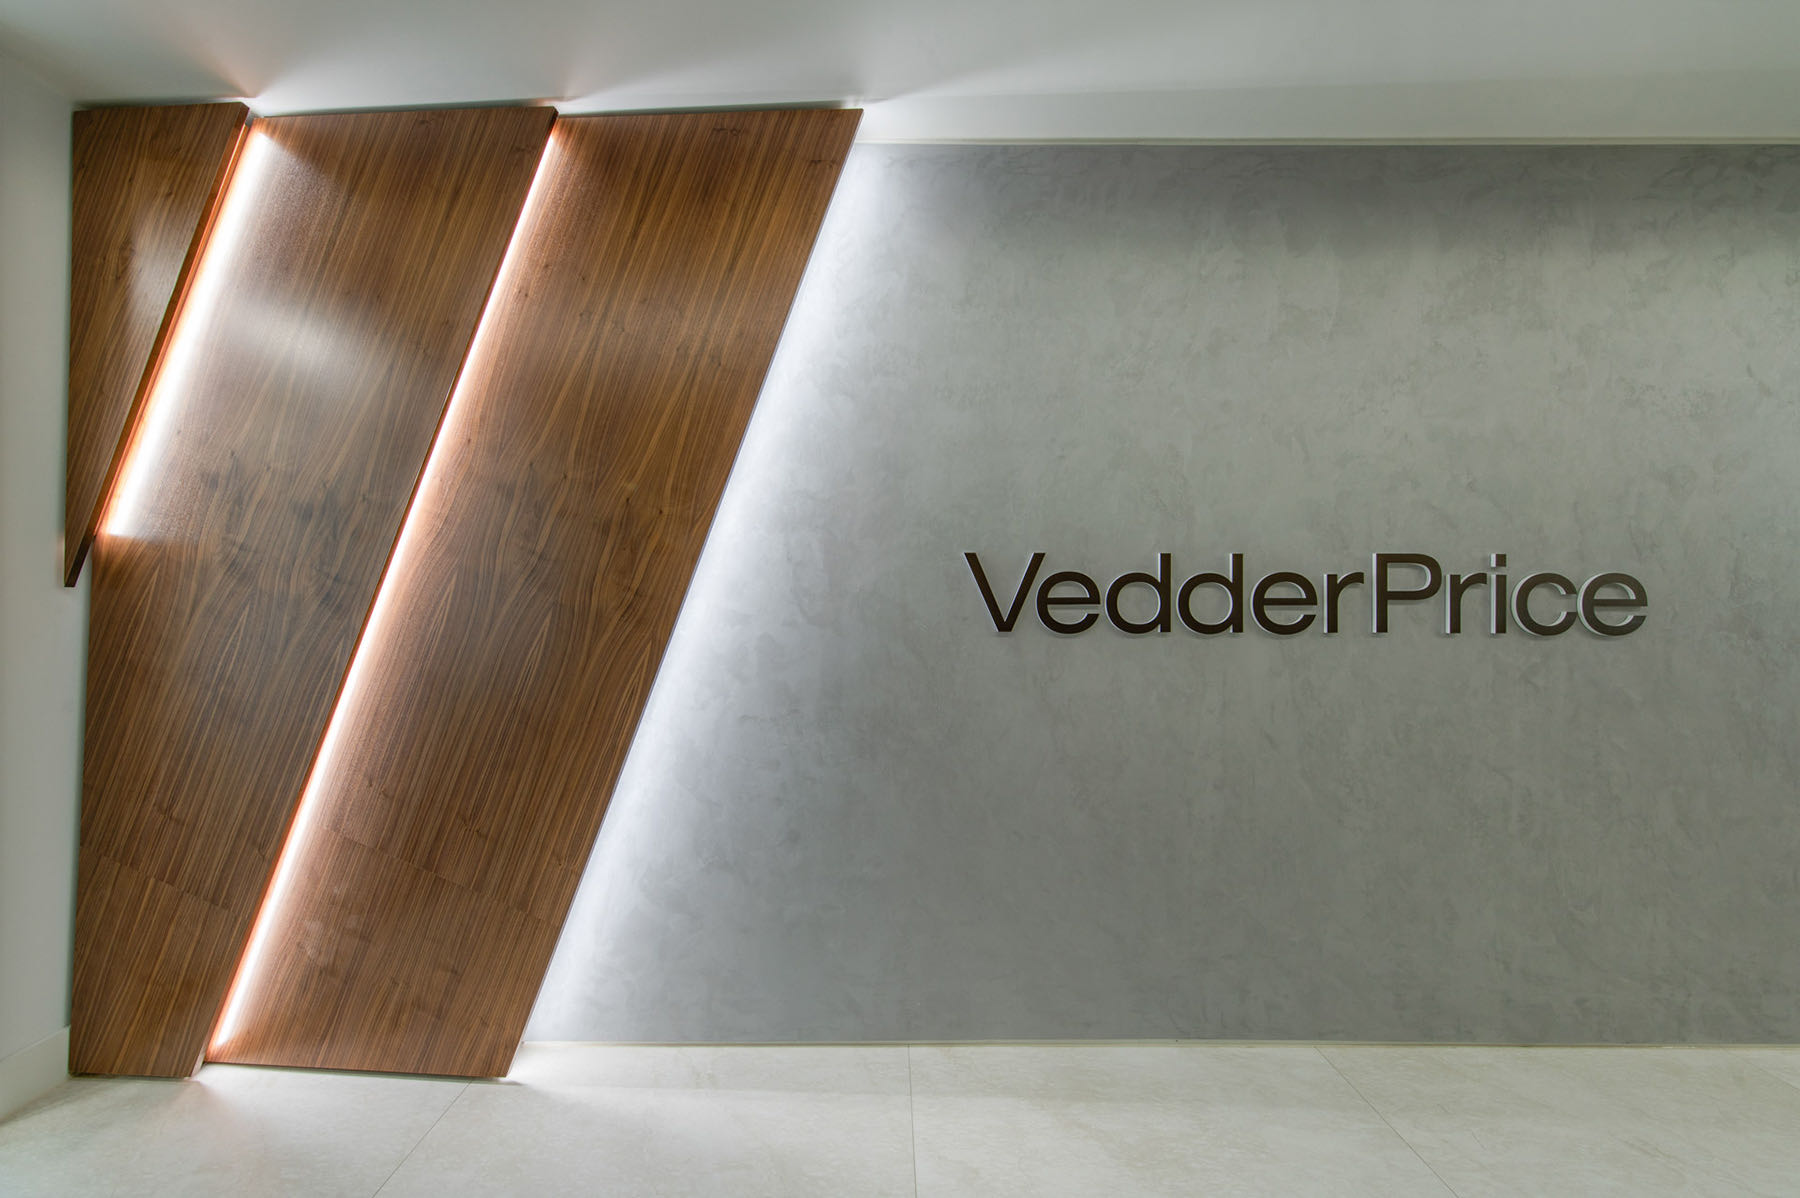 vedder-price-london-office-2